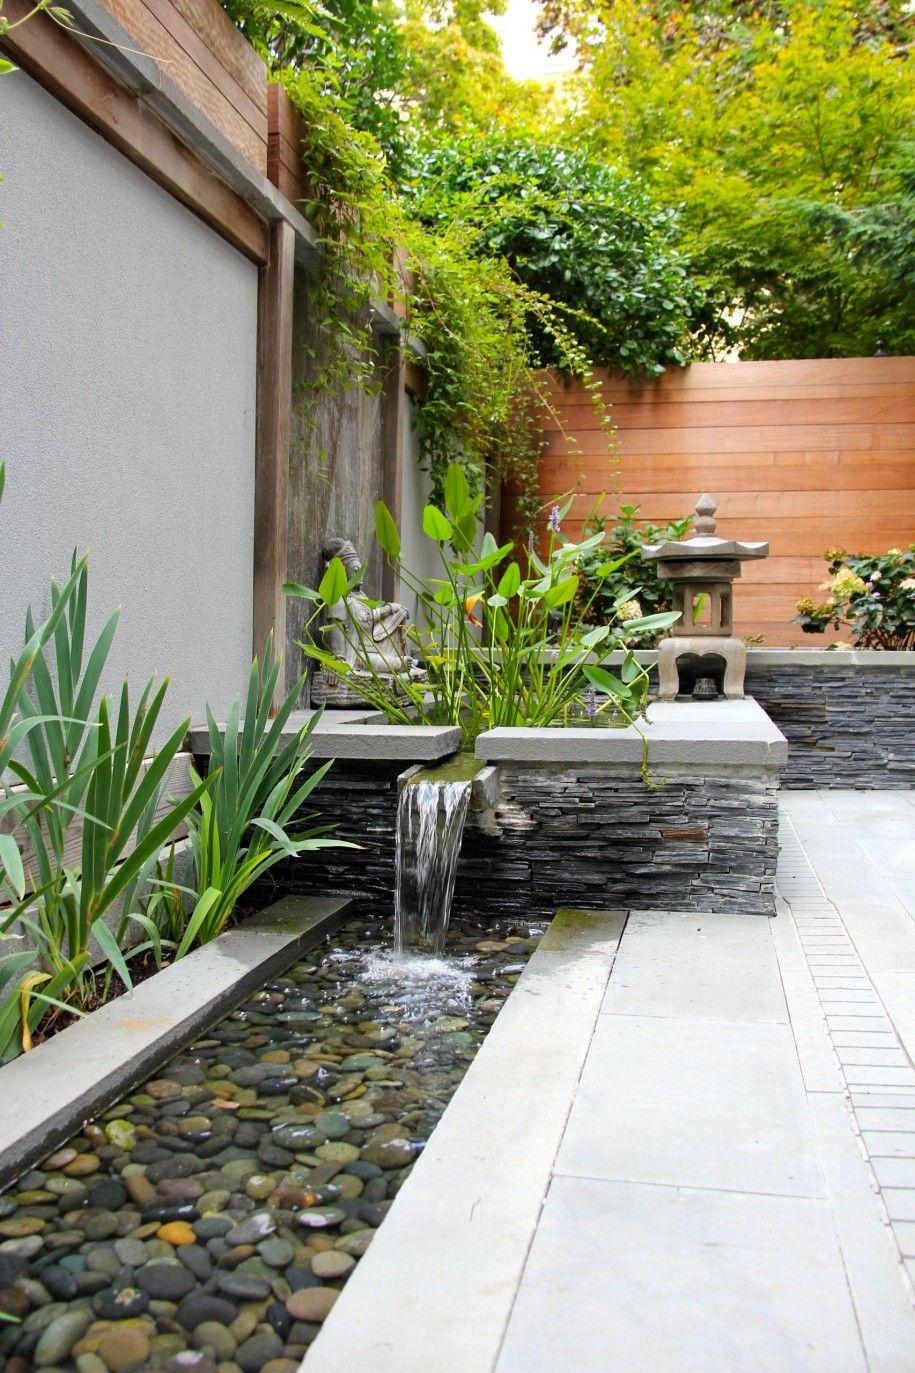 Herb Garden Ideas For Patio how to make fresh garden in your backyard with outdoor fountain